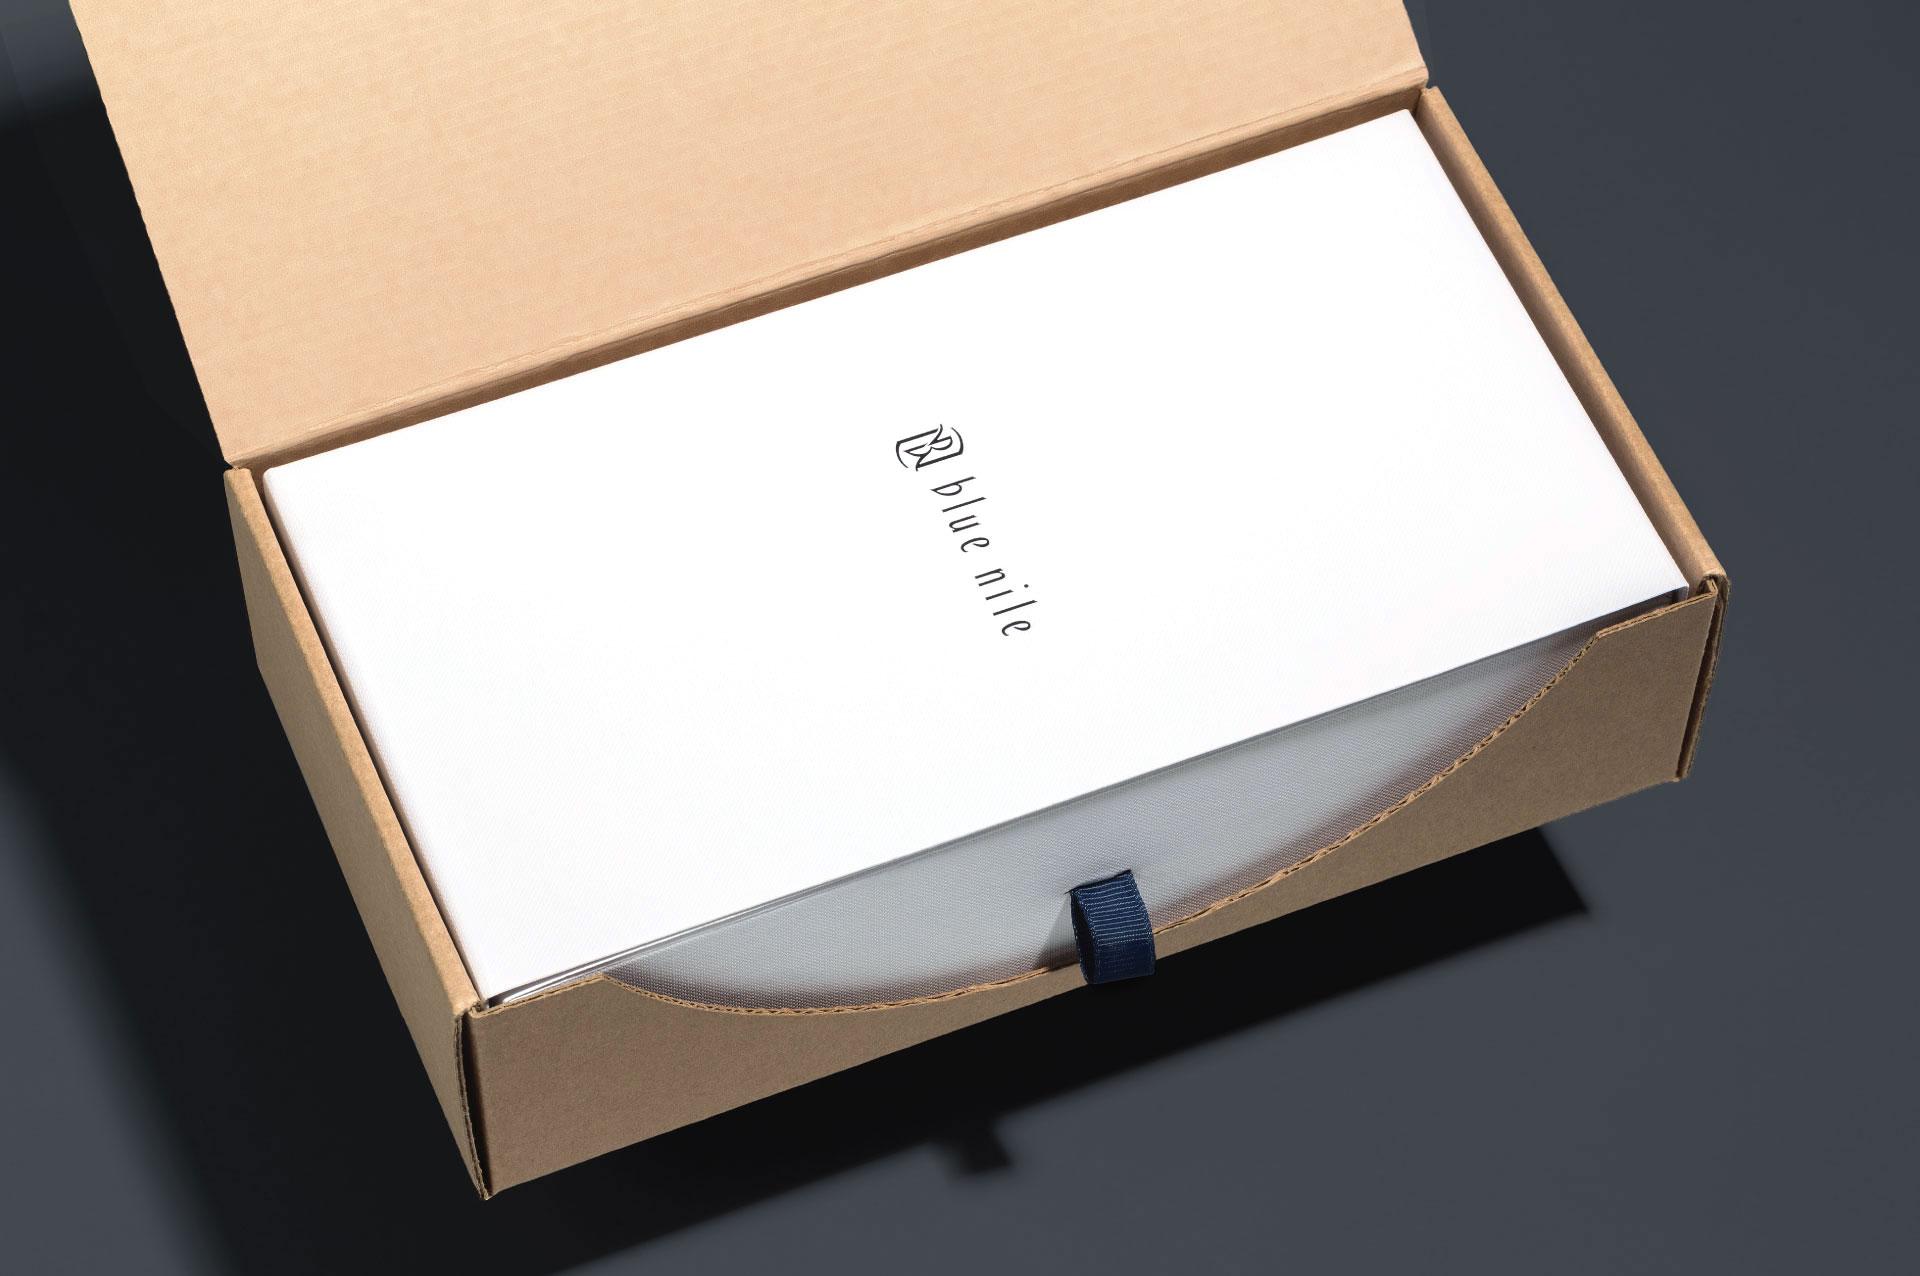 Blue Nile Shipper and Box